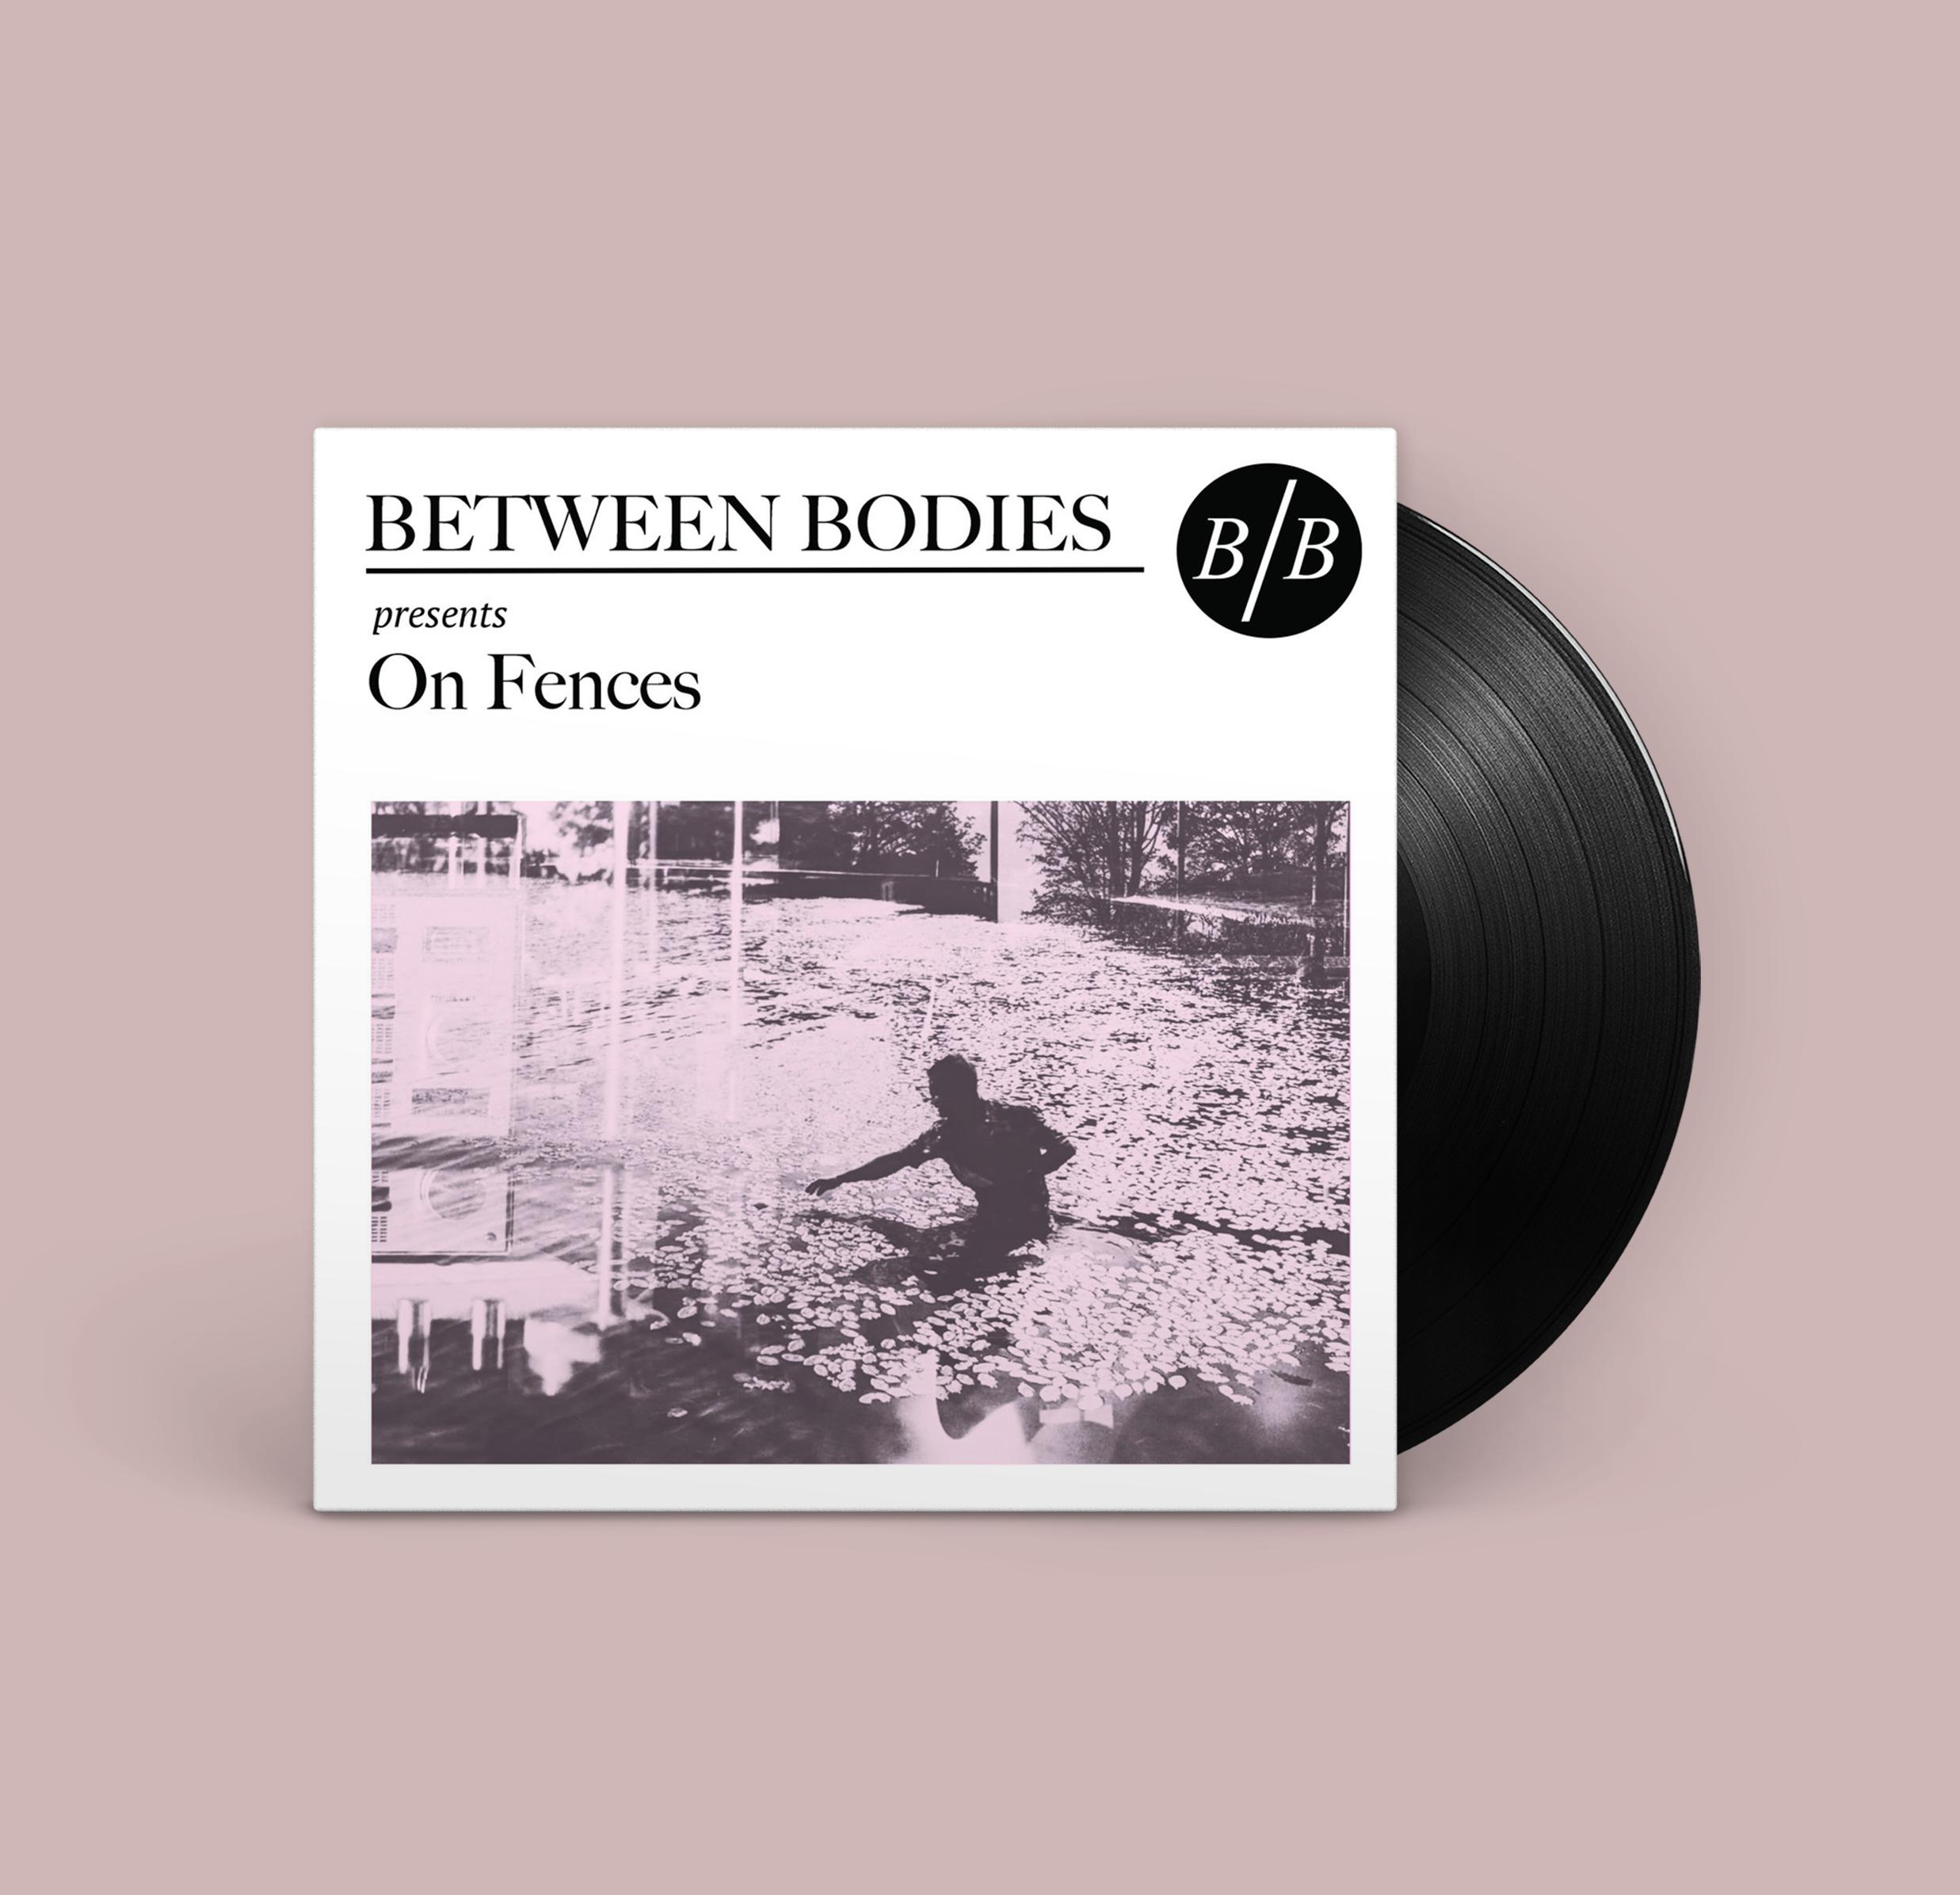 Between Bodies - On Fences (10